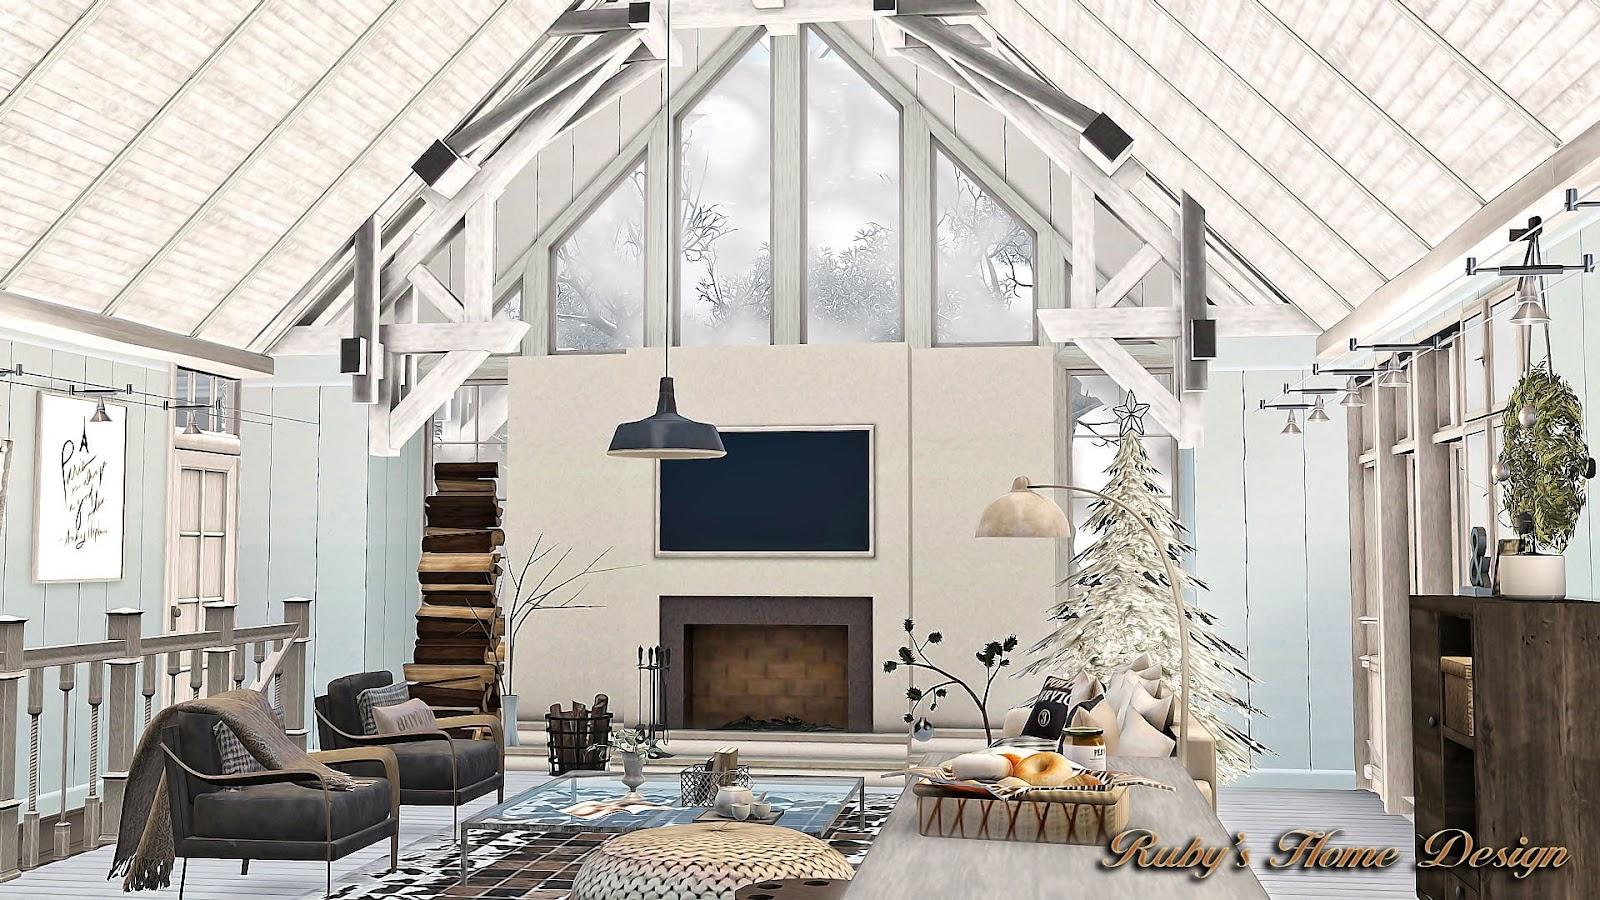 Sims3 Winter Farmhouse 冬之屋 Ruby S Home Design